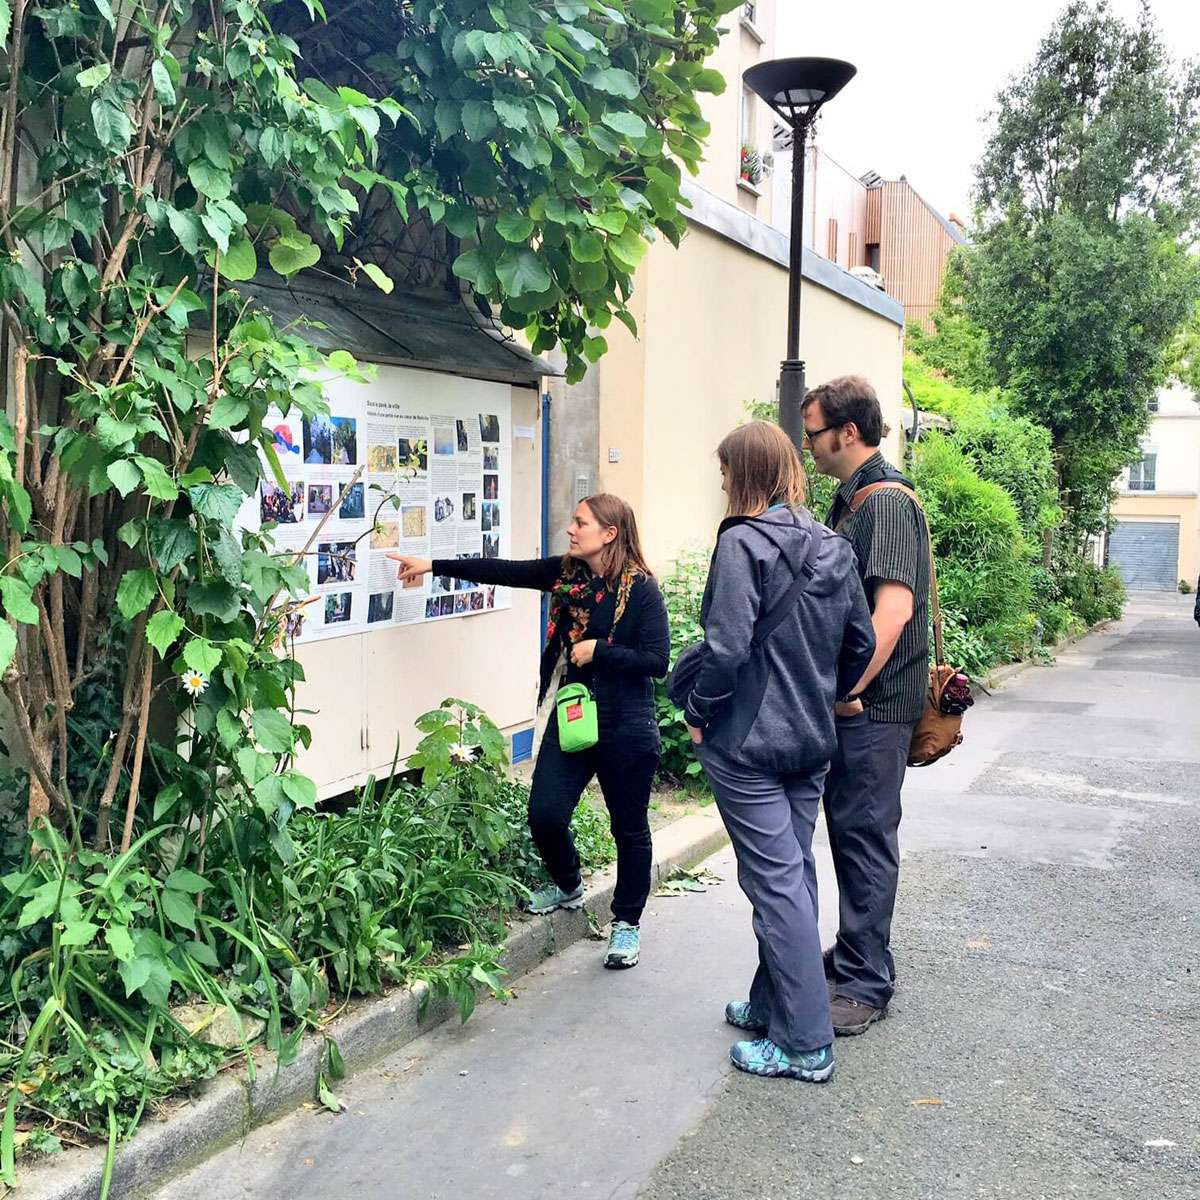 Paris greeters. Photo: Klaus Bostelmann